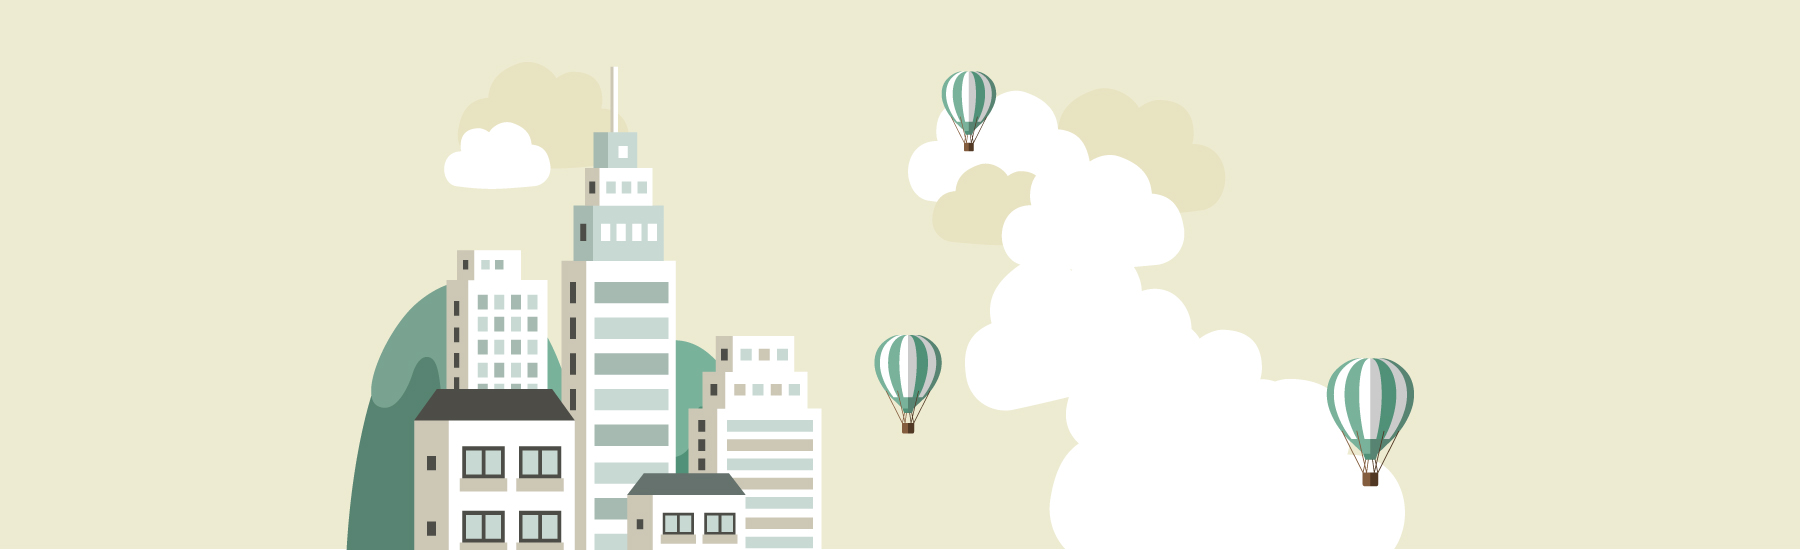 balloon-sky